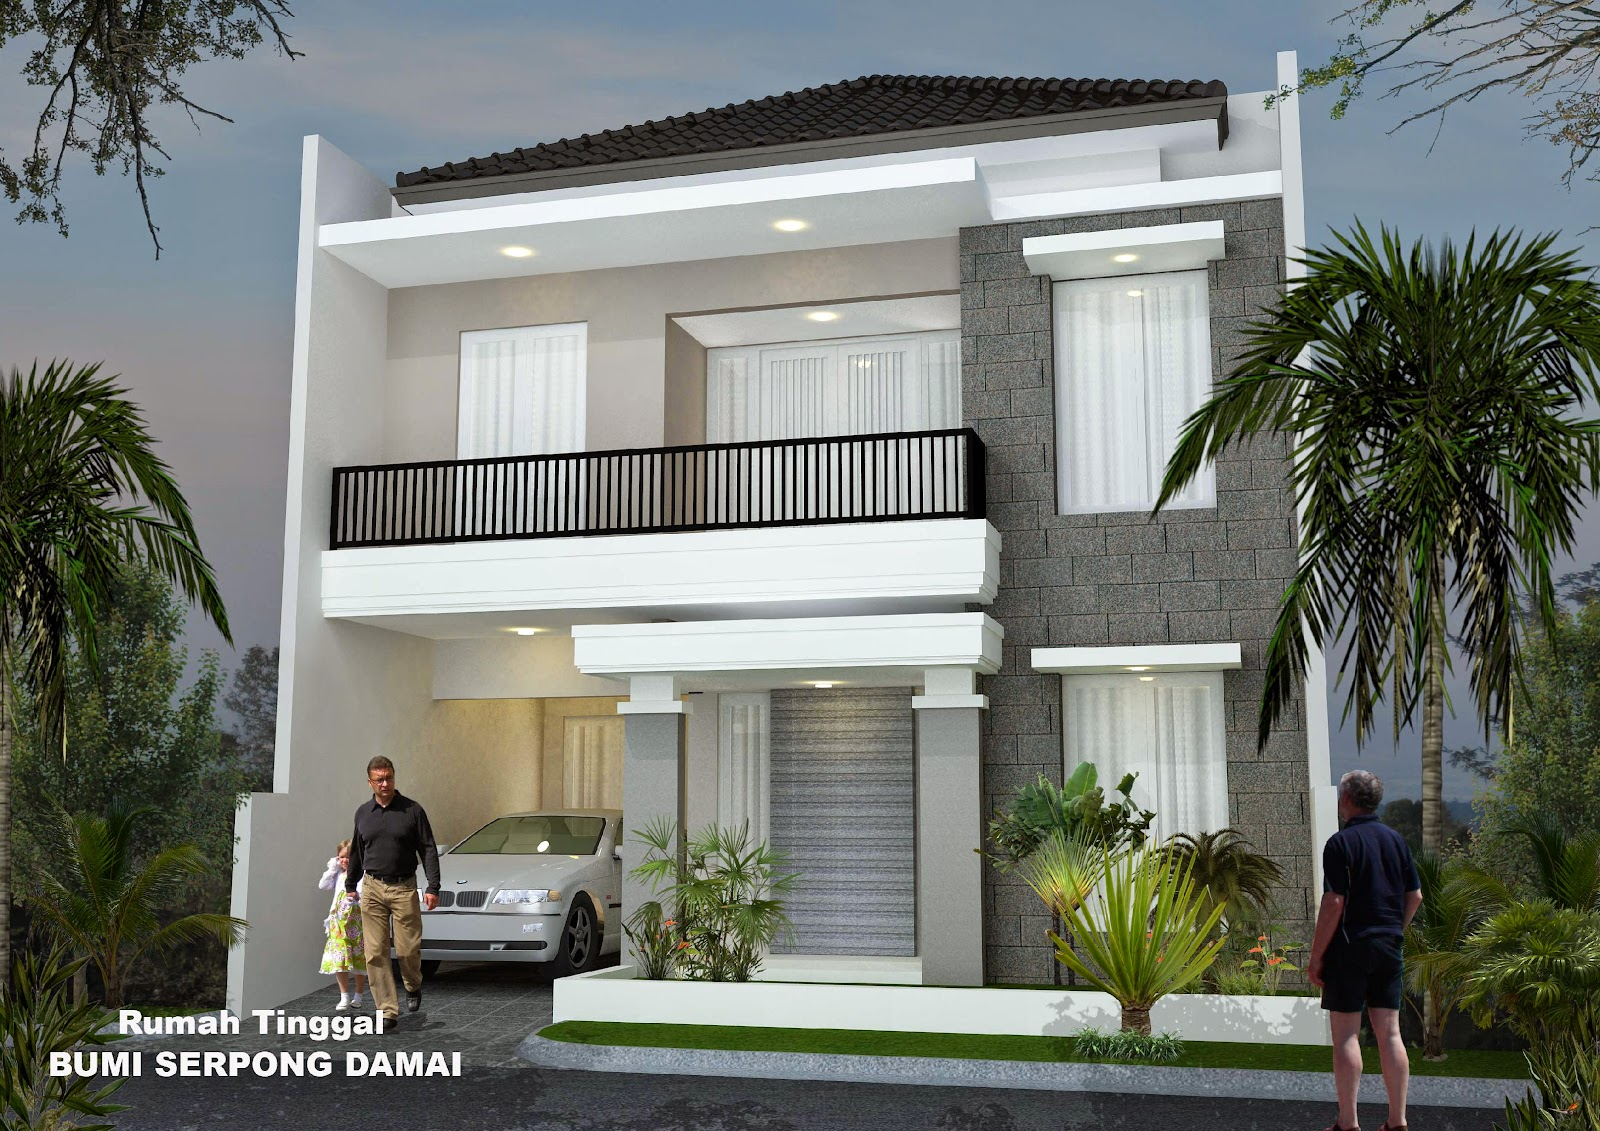 Rumah Tingkat Minimalis Design Rumah Minimalis & Kumpulan Gambar Desain Rumah Joglo Minimalis | Kumpulan Desain Rumah